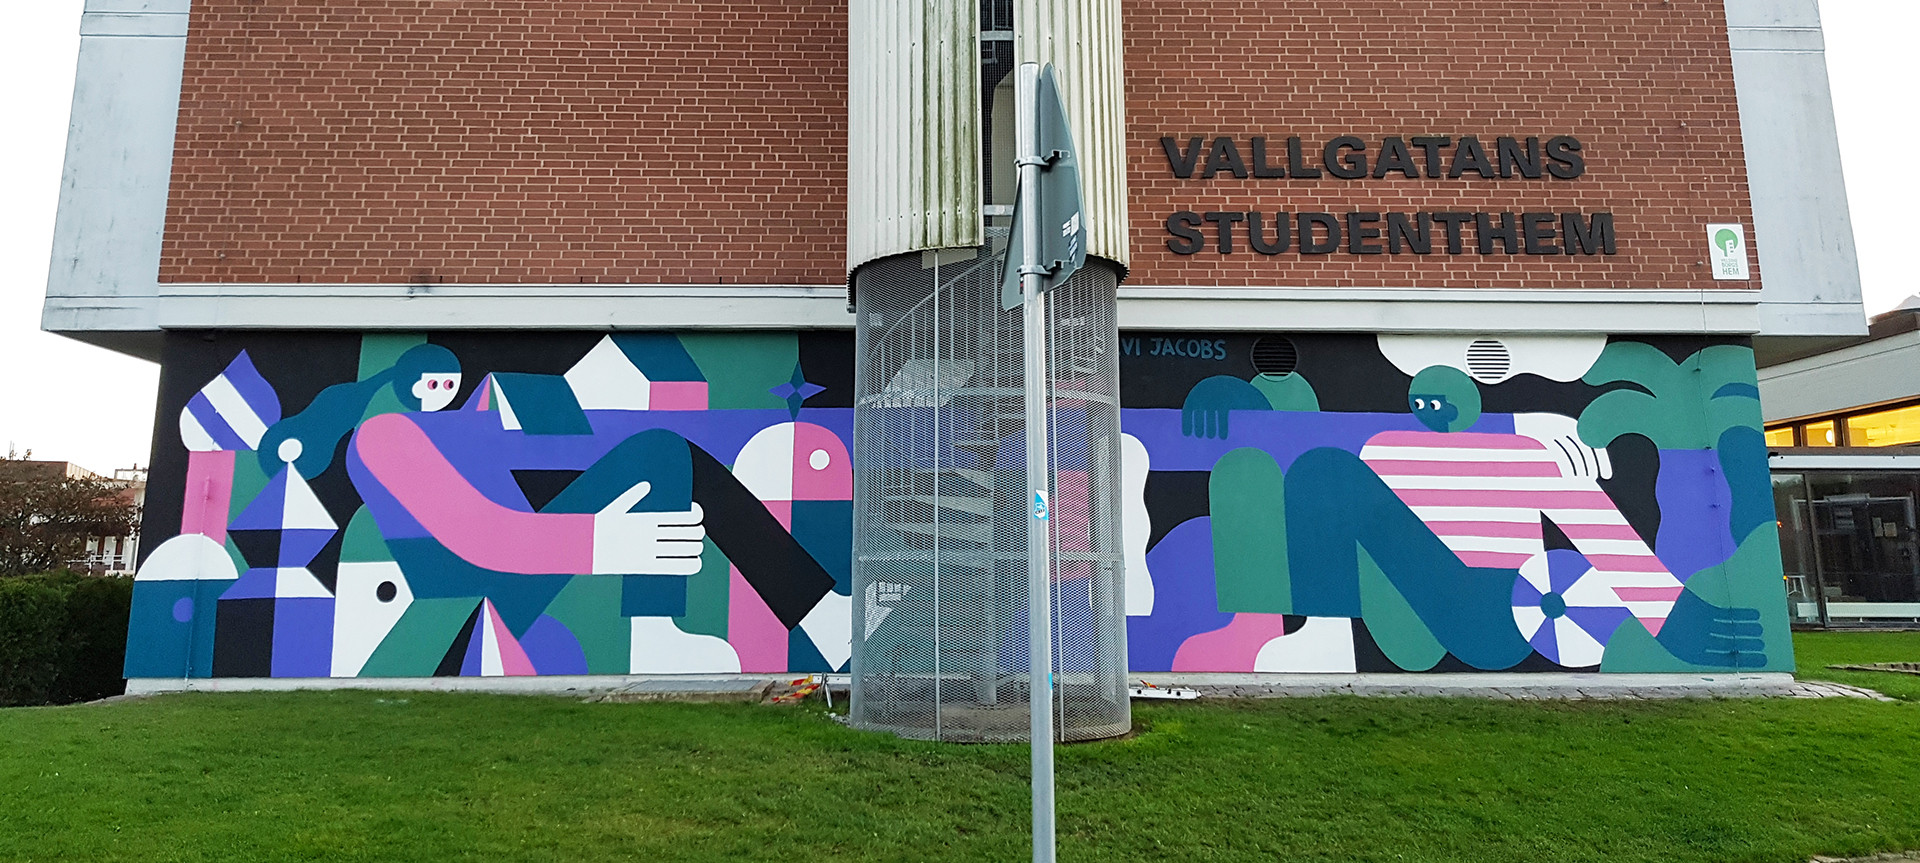 Muralsweden2W2.jpg